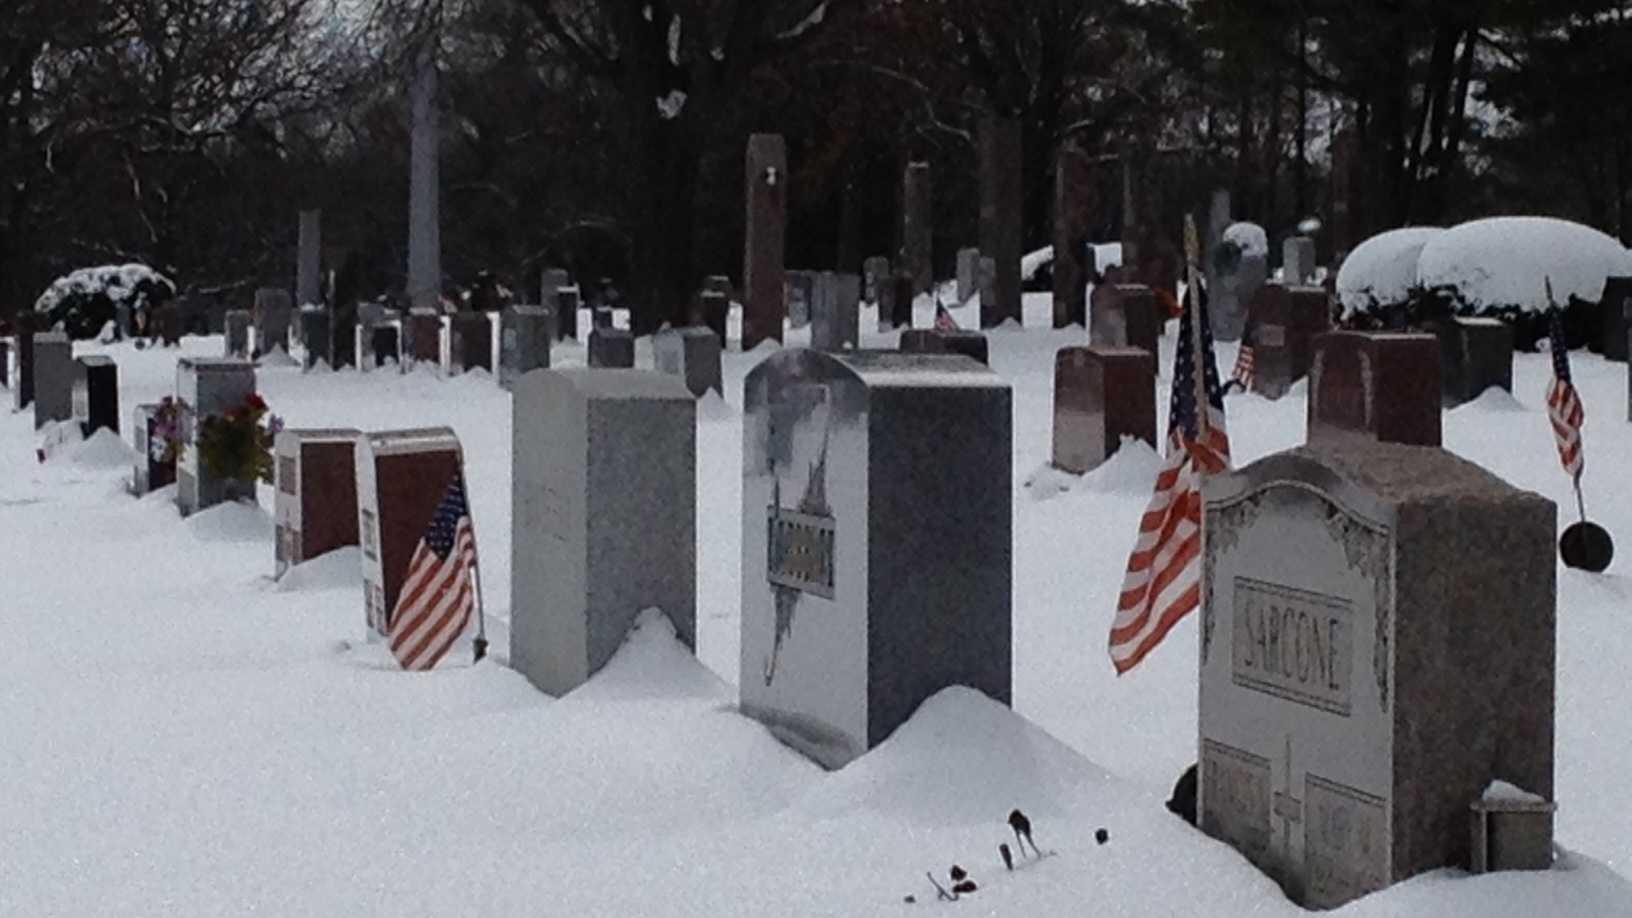 Snowy cemetery generic